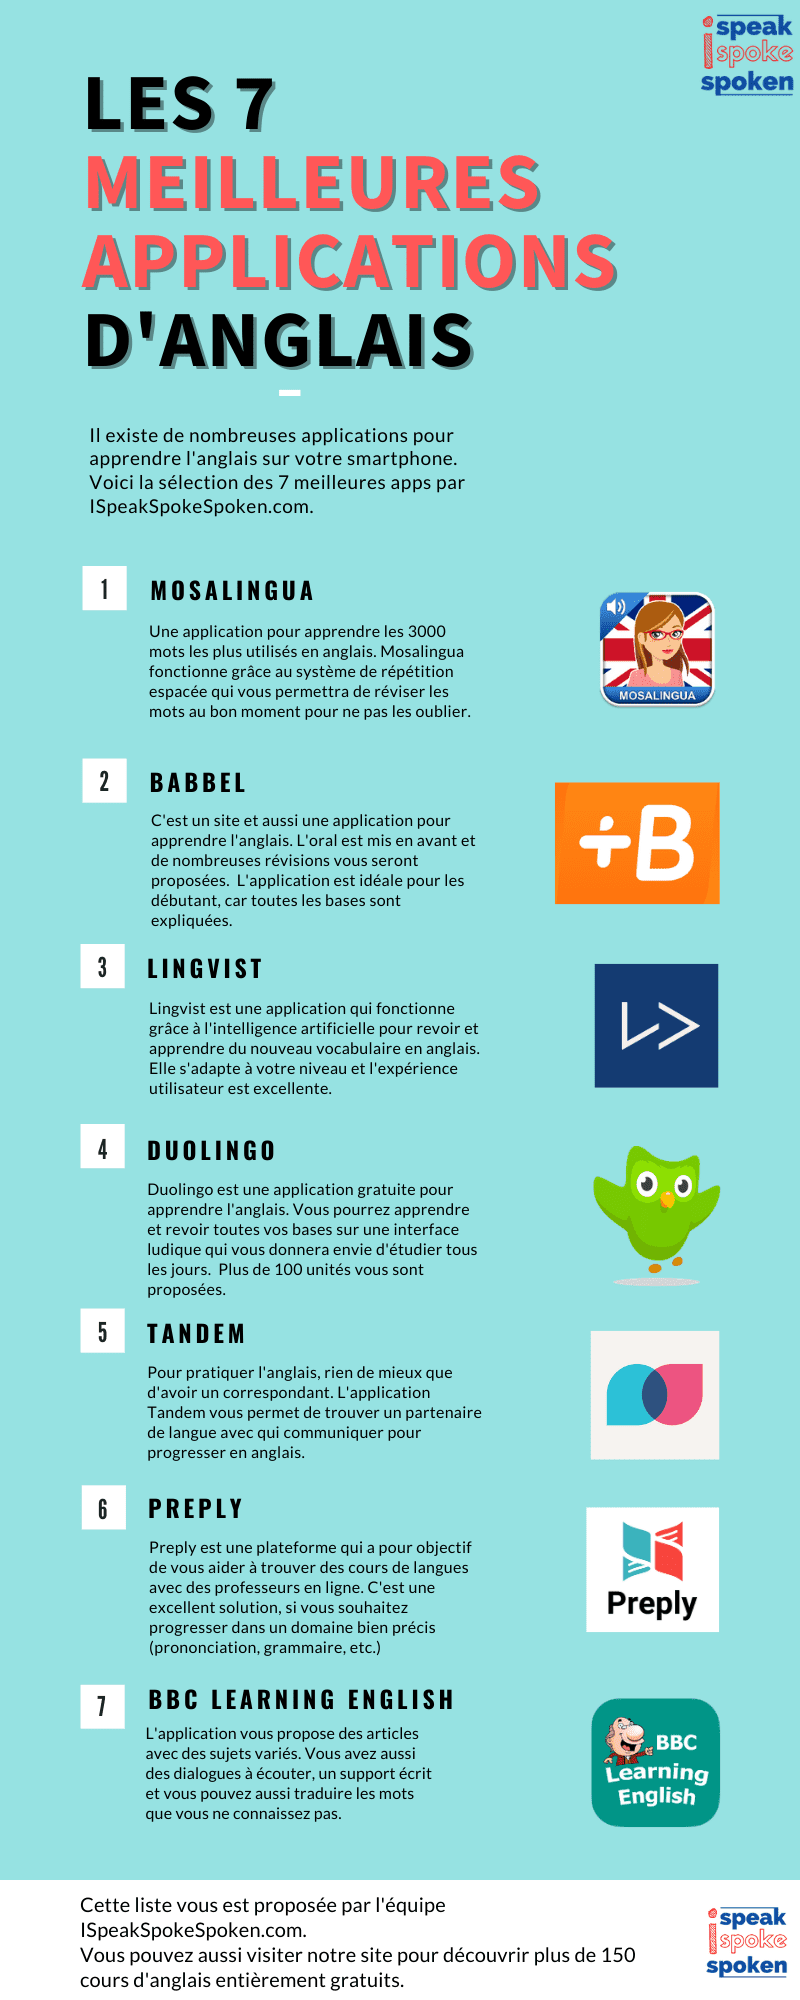 les 7 meilleures applications pour apprendre l'anglais : mosalingua, babbel, linguist, Duolingo, tandem, preply, bbc learning english